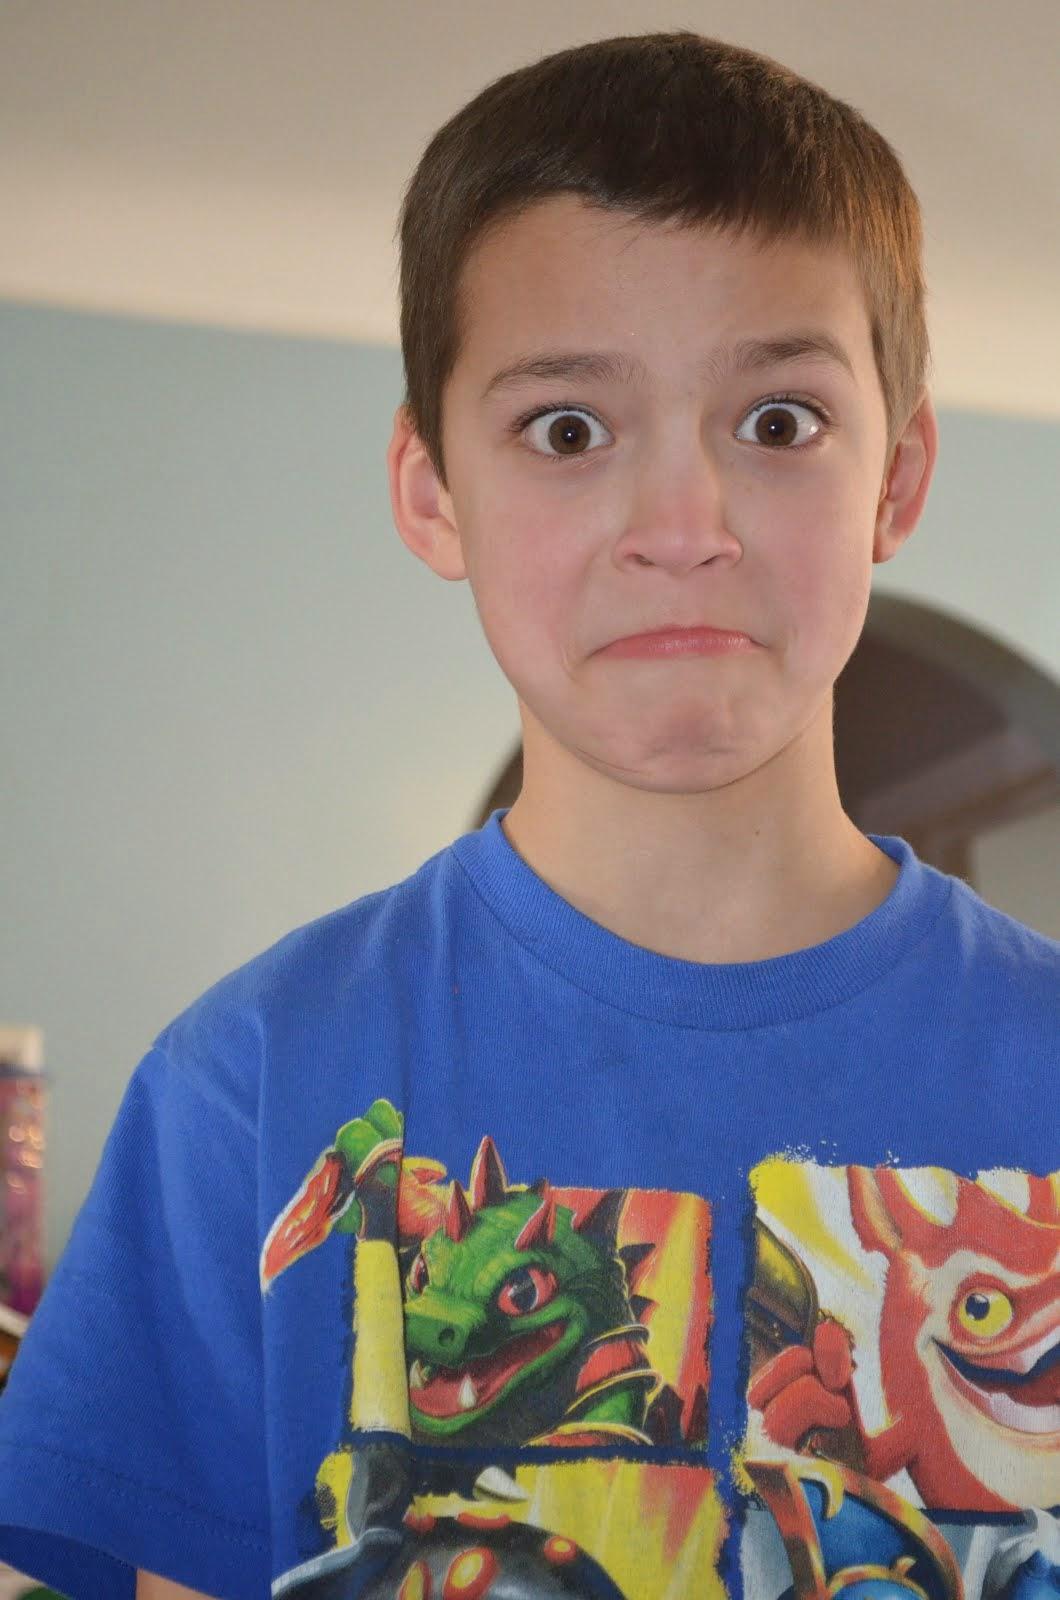 Peyton - age 10